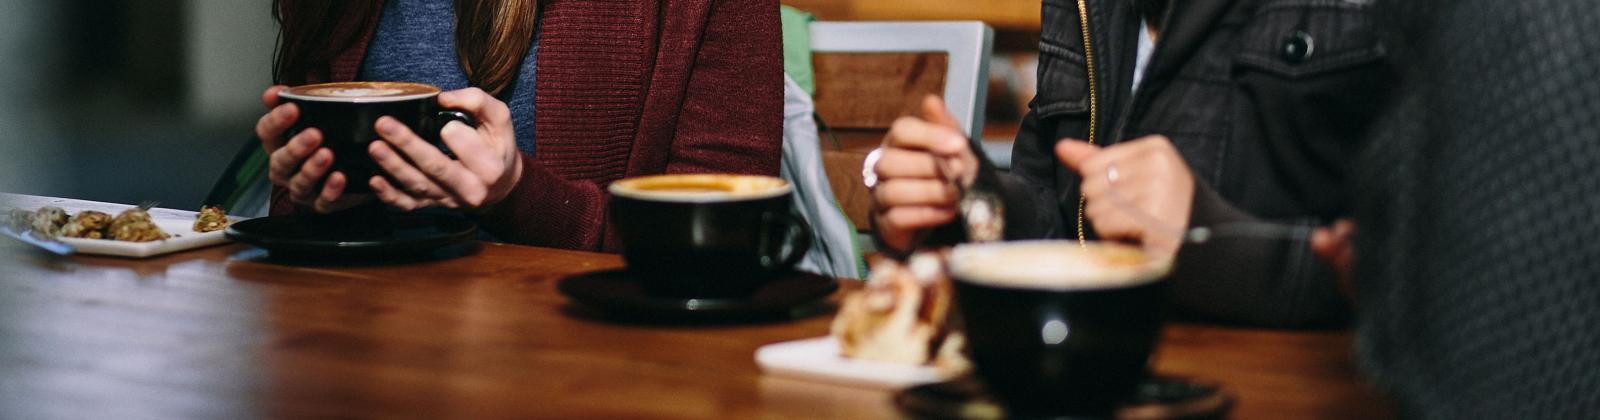 2 female students having coffee